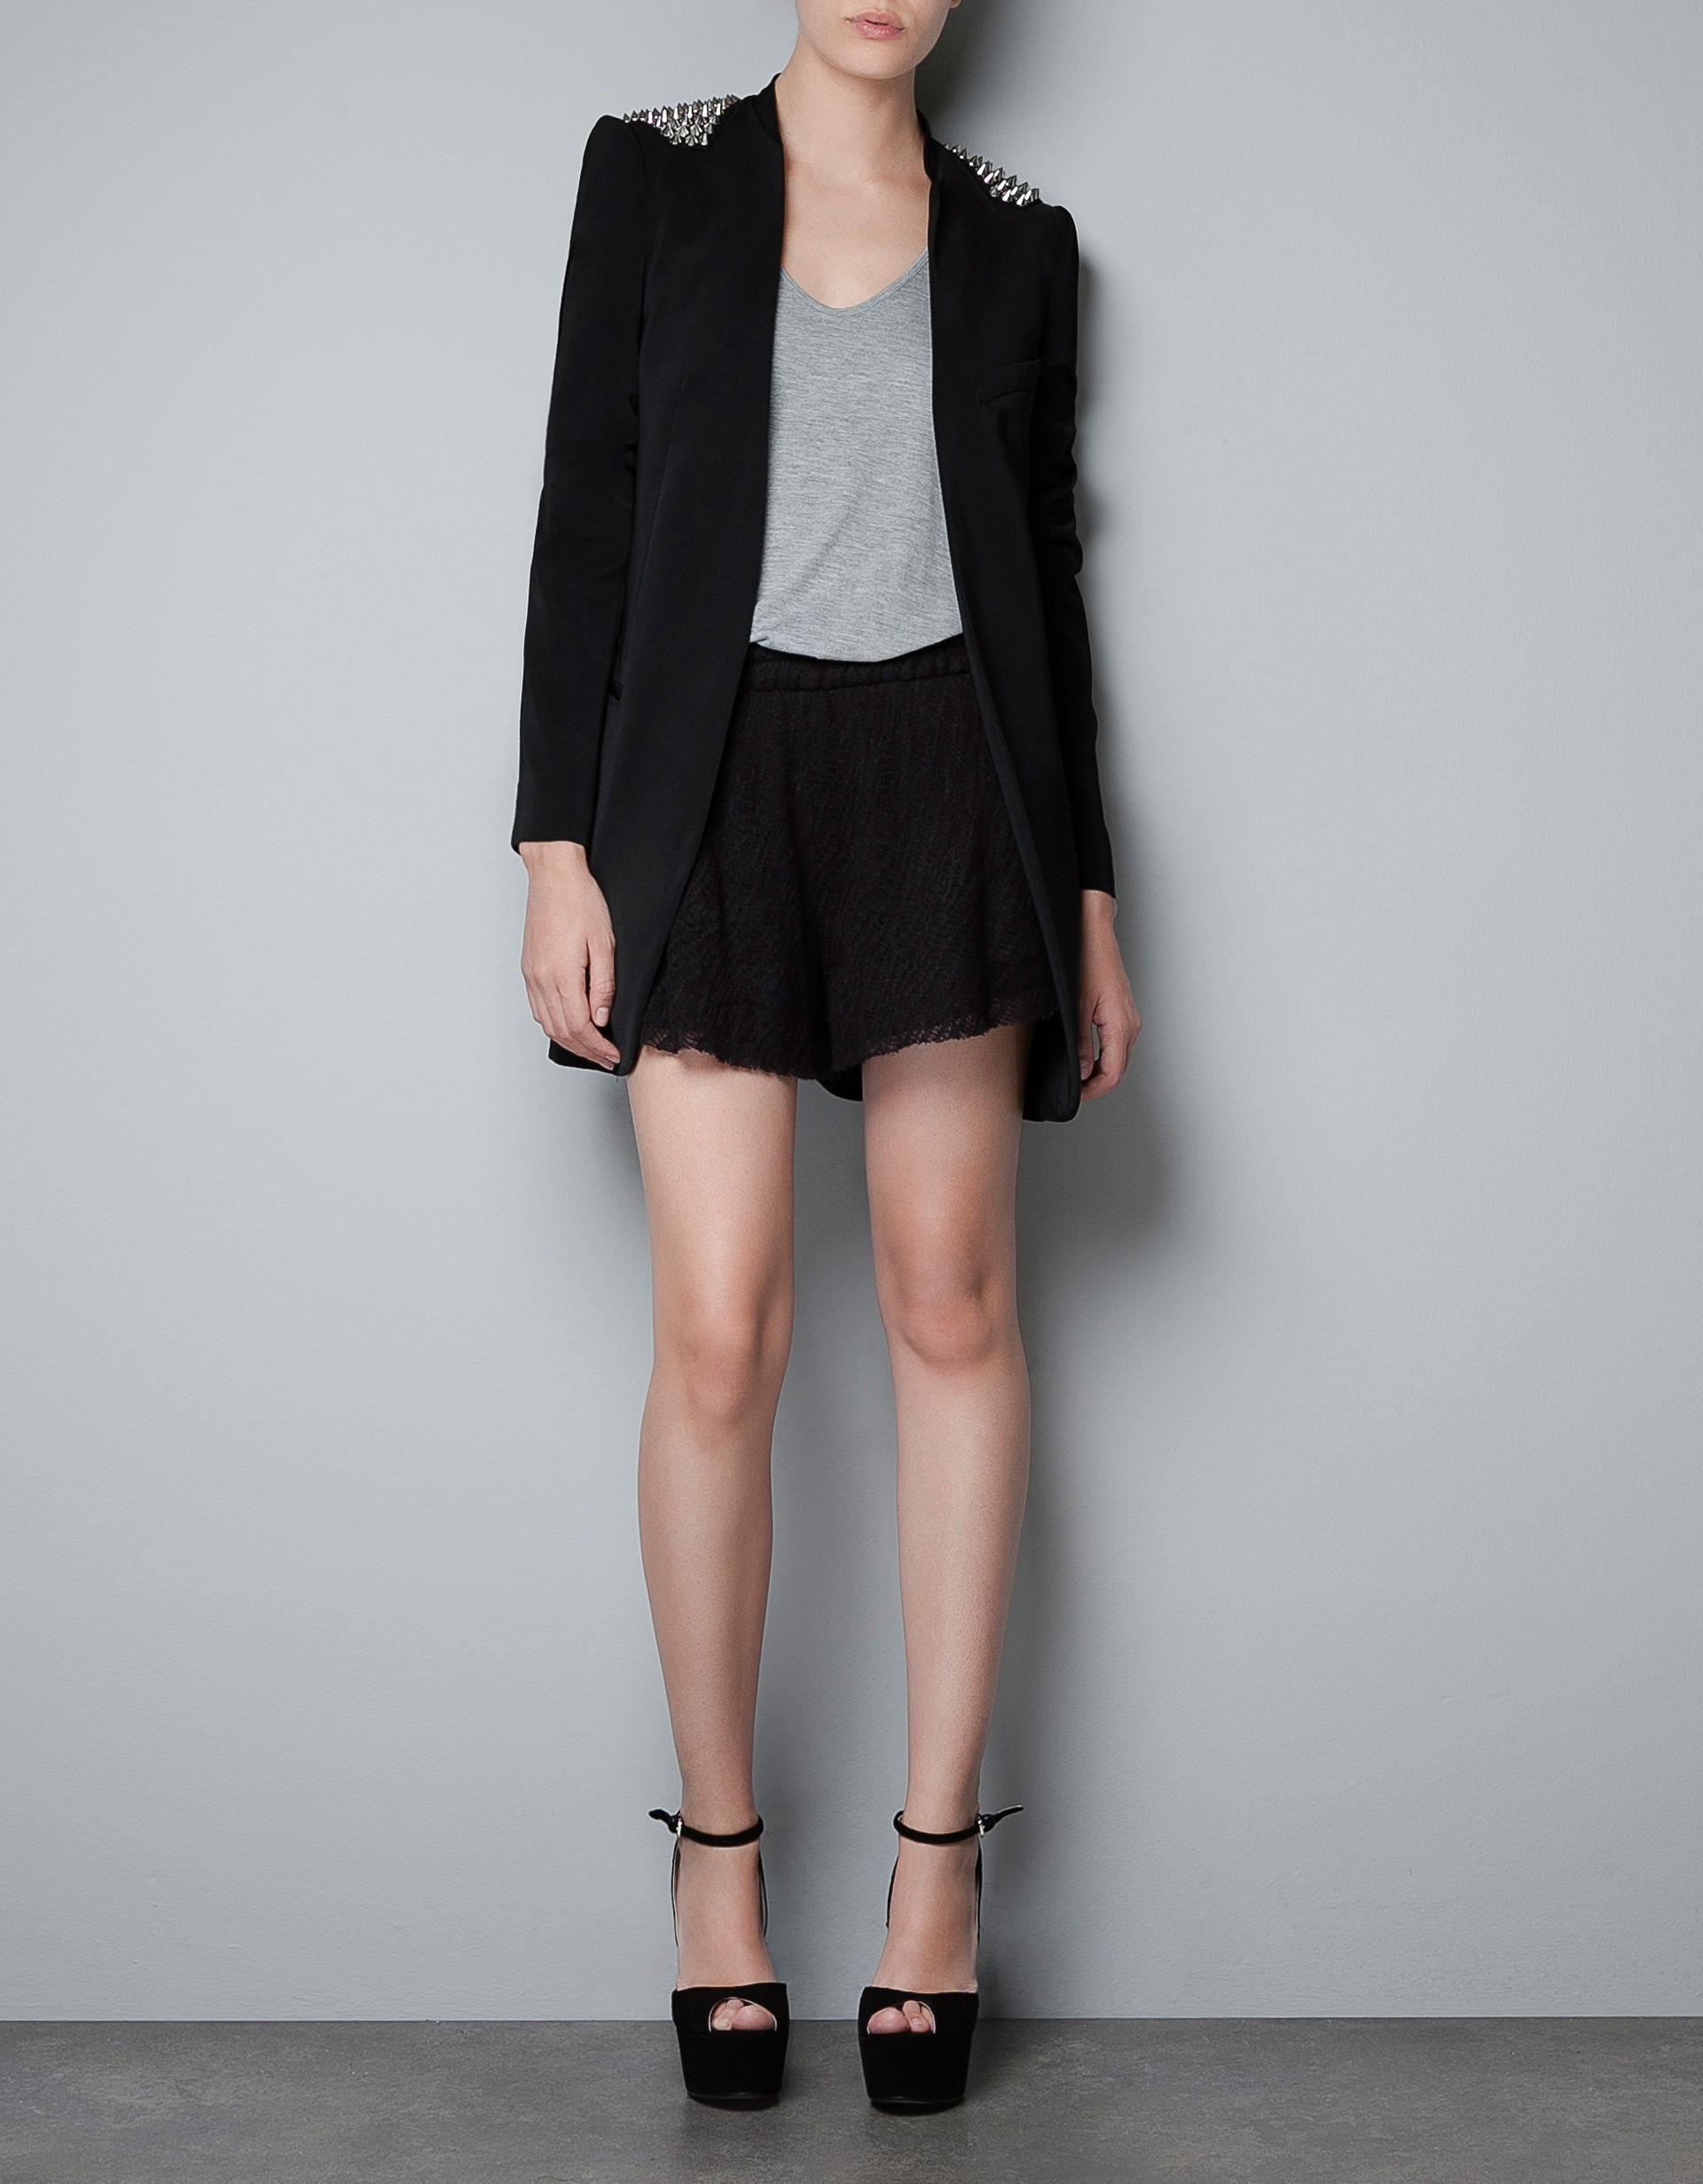 zara blazer with spikes on the shoulder in black lyst. Black Bedroom Furniture Sets. Home Design Ideas